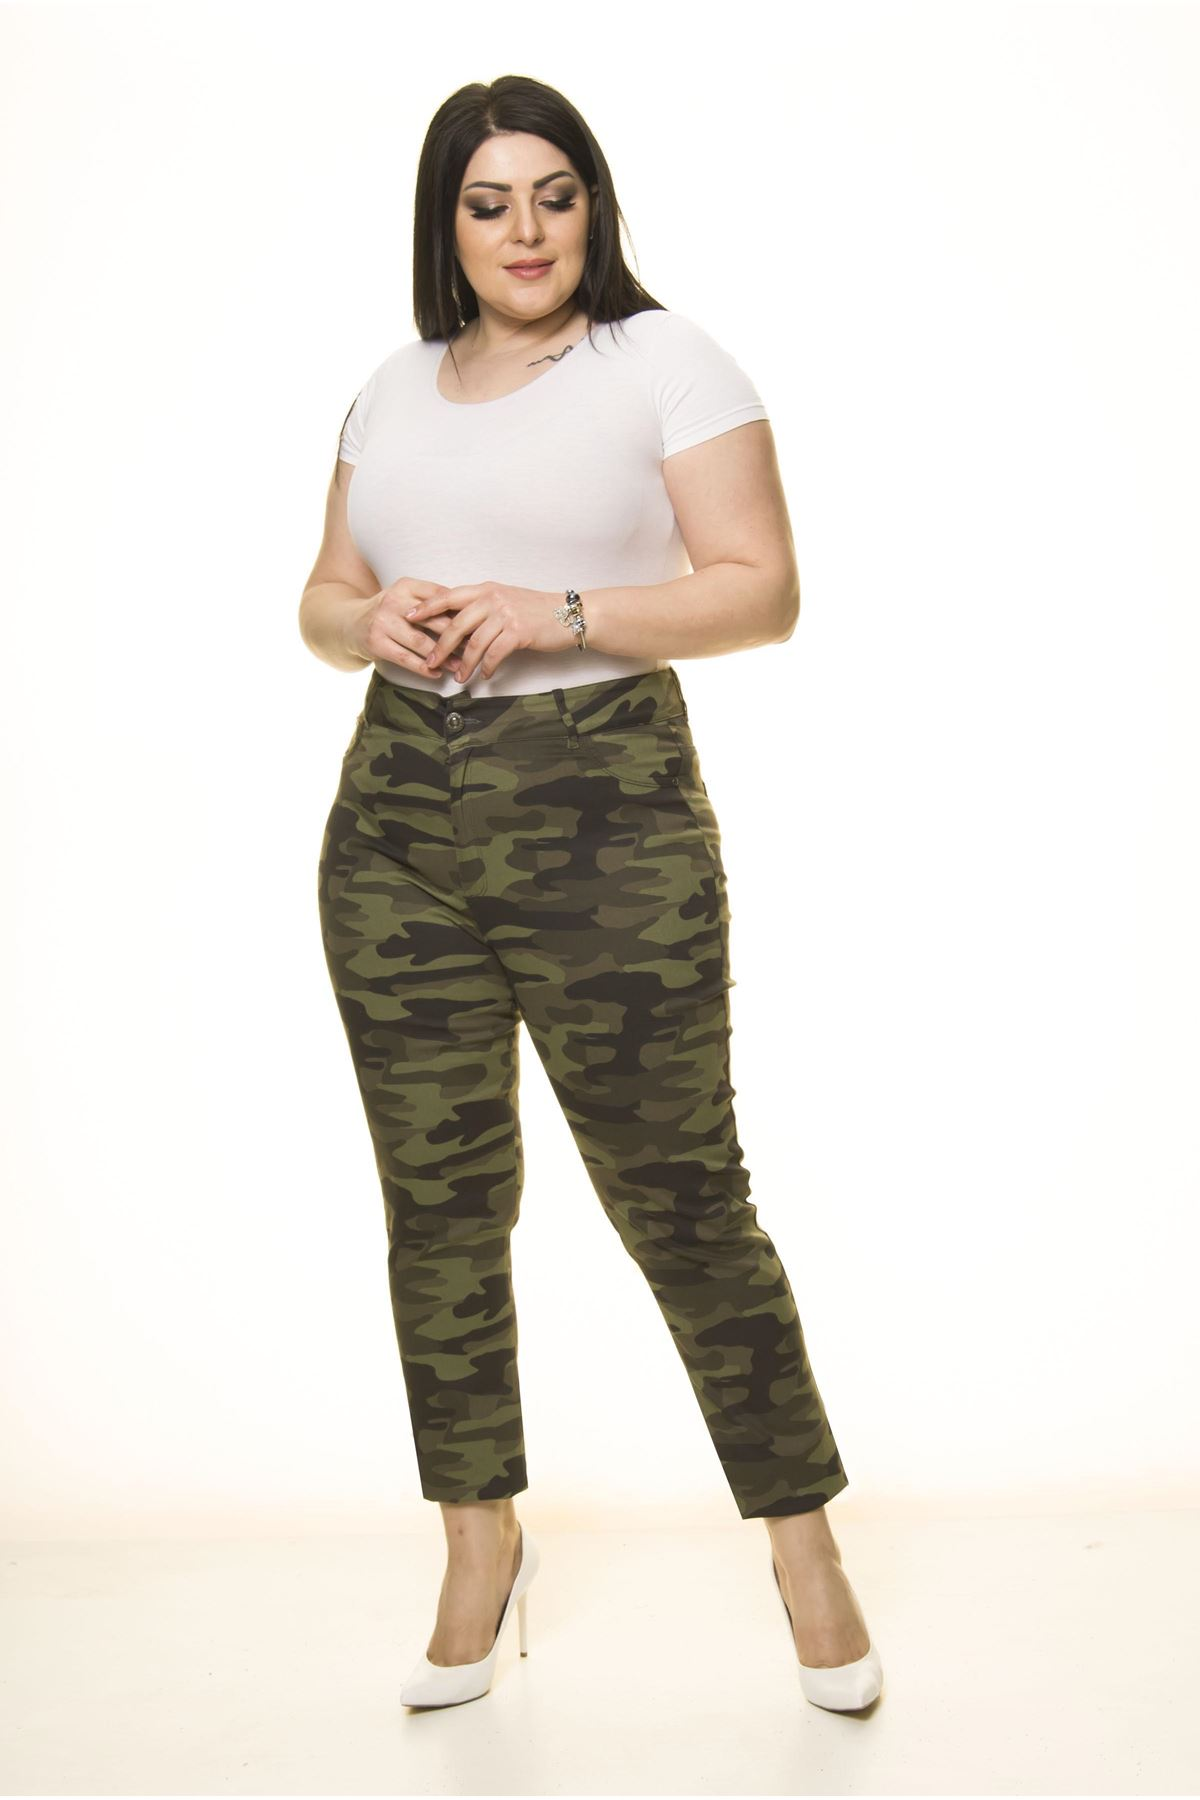 Cepli Yeşil Kamuflaj Büyük Beden Pantolon L2-1680